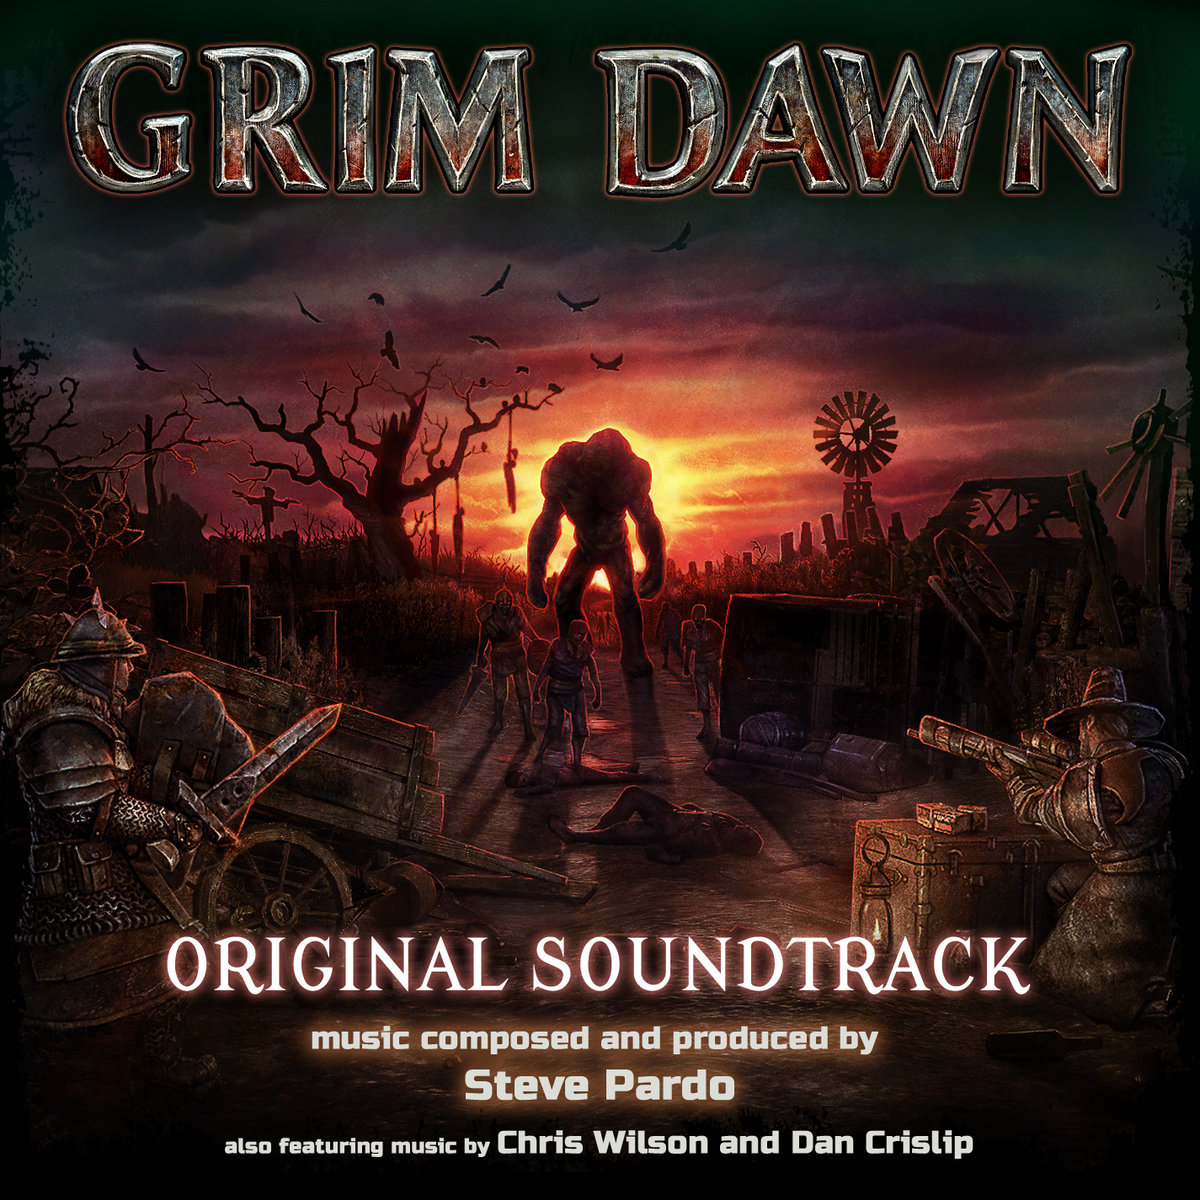 Grim dawn crack